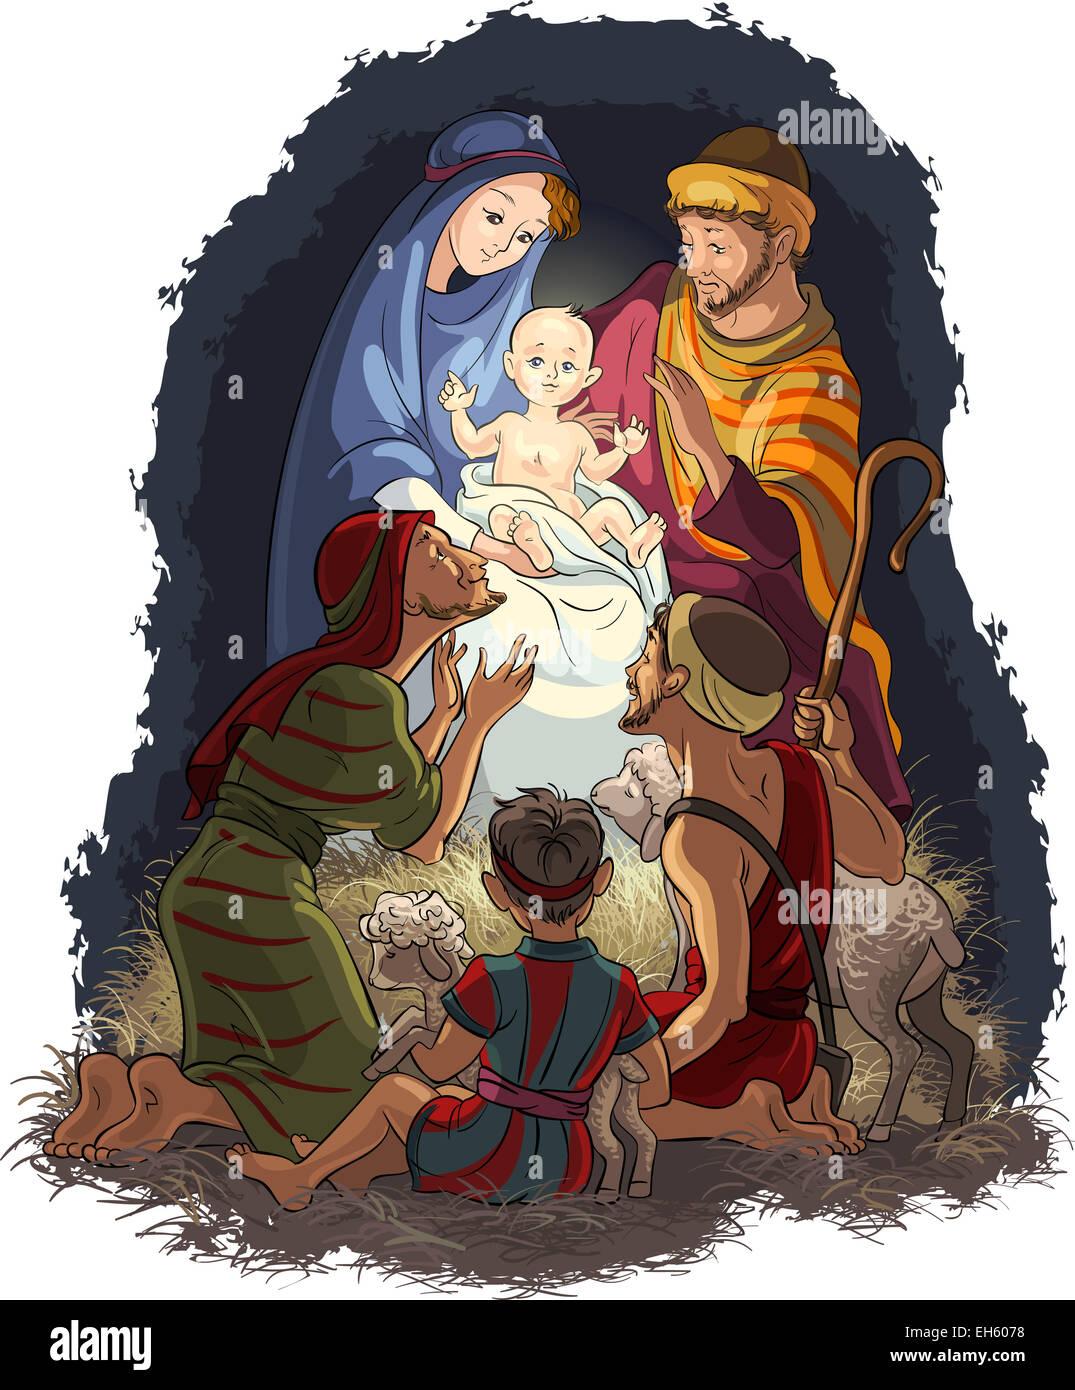 Mary und Joseph Beten Das Christkind An Stockfotos & Mary und Joseph ...